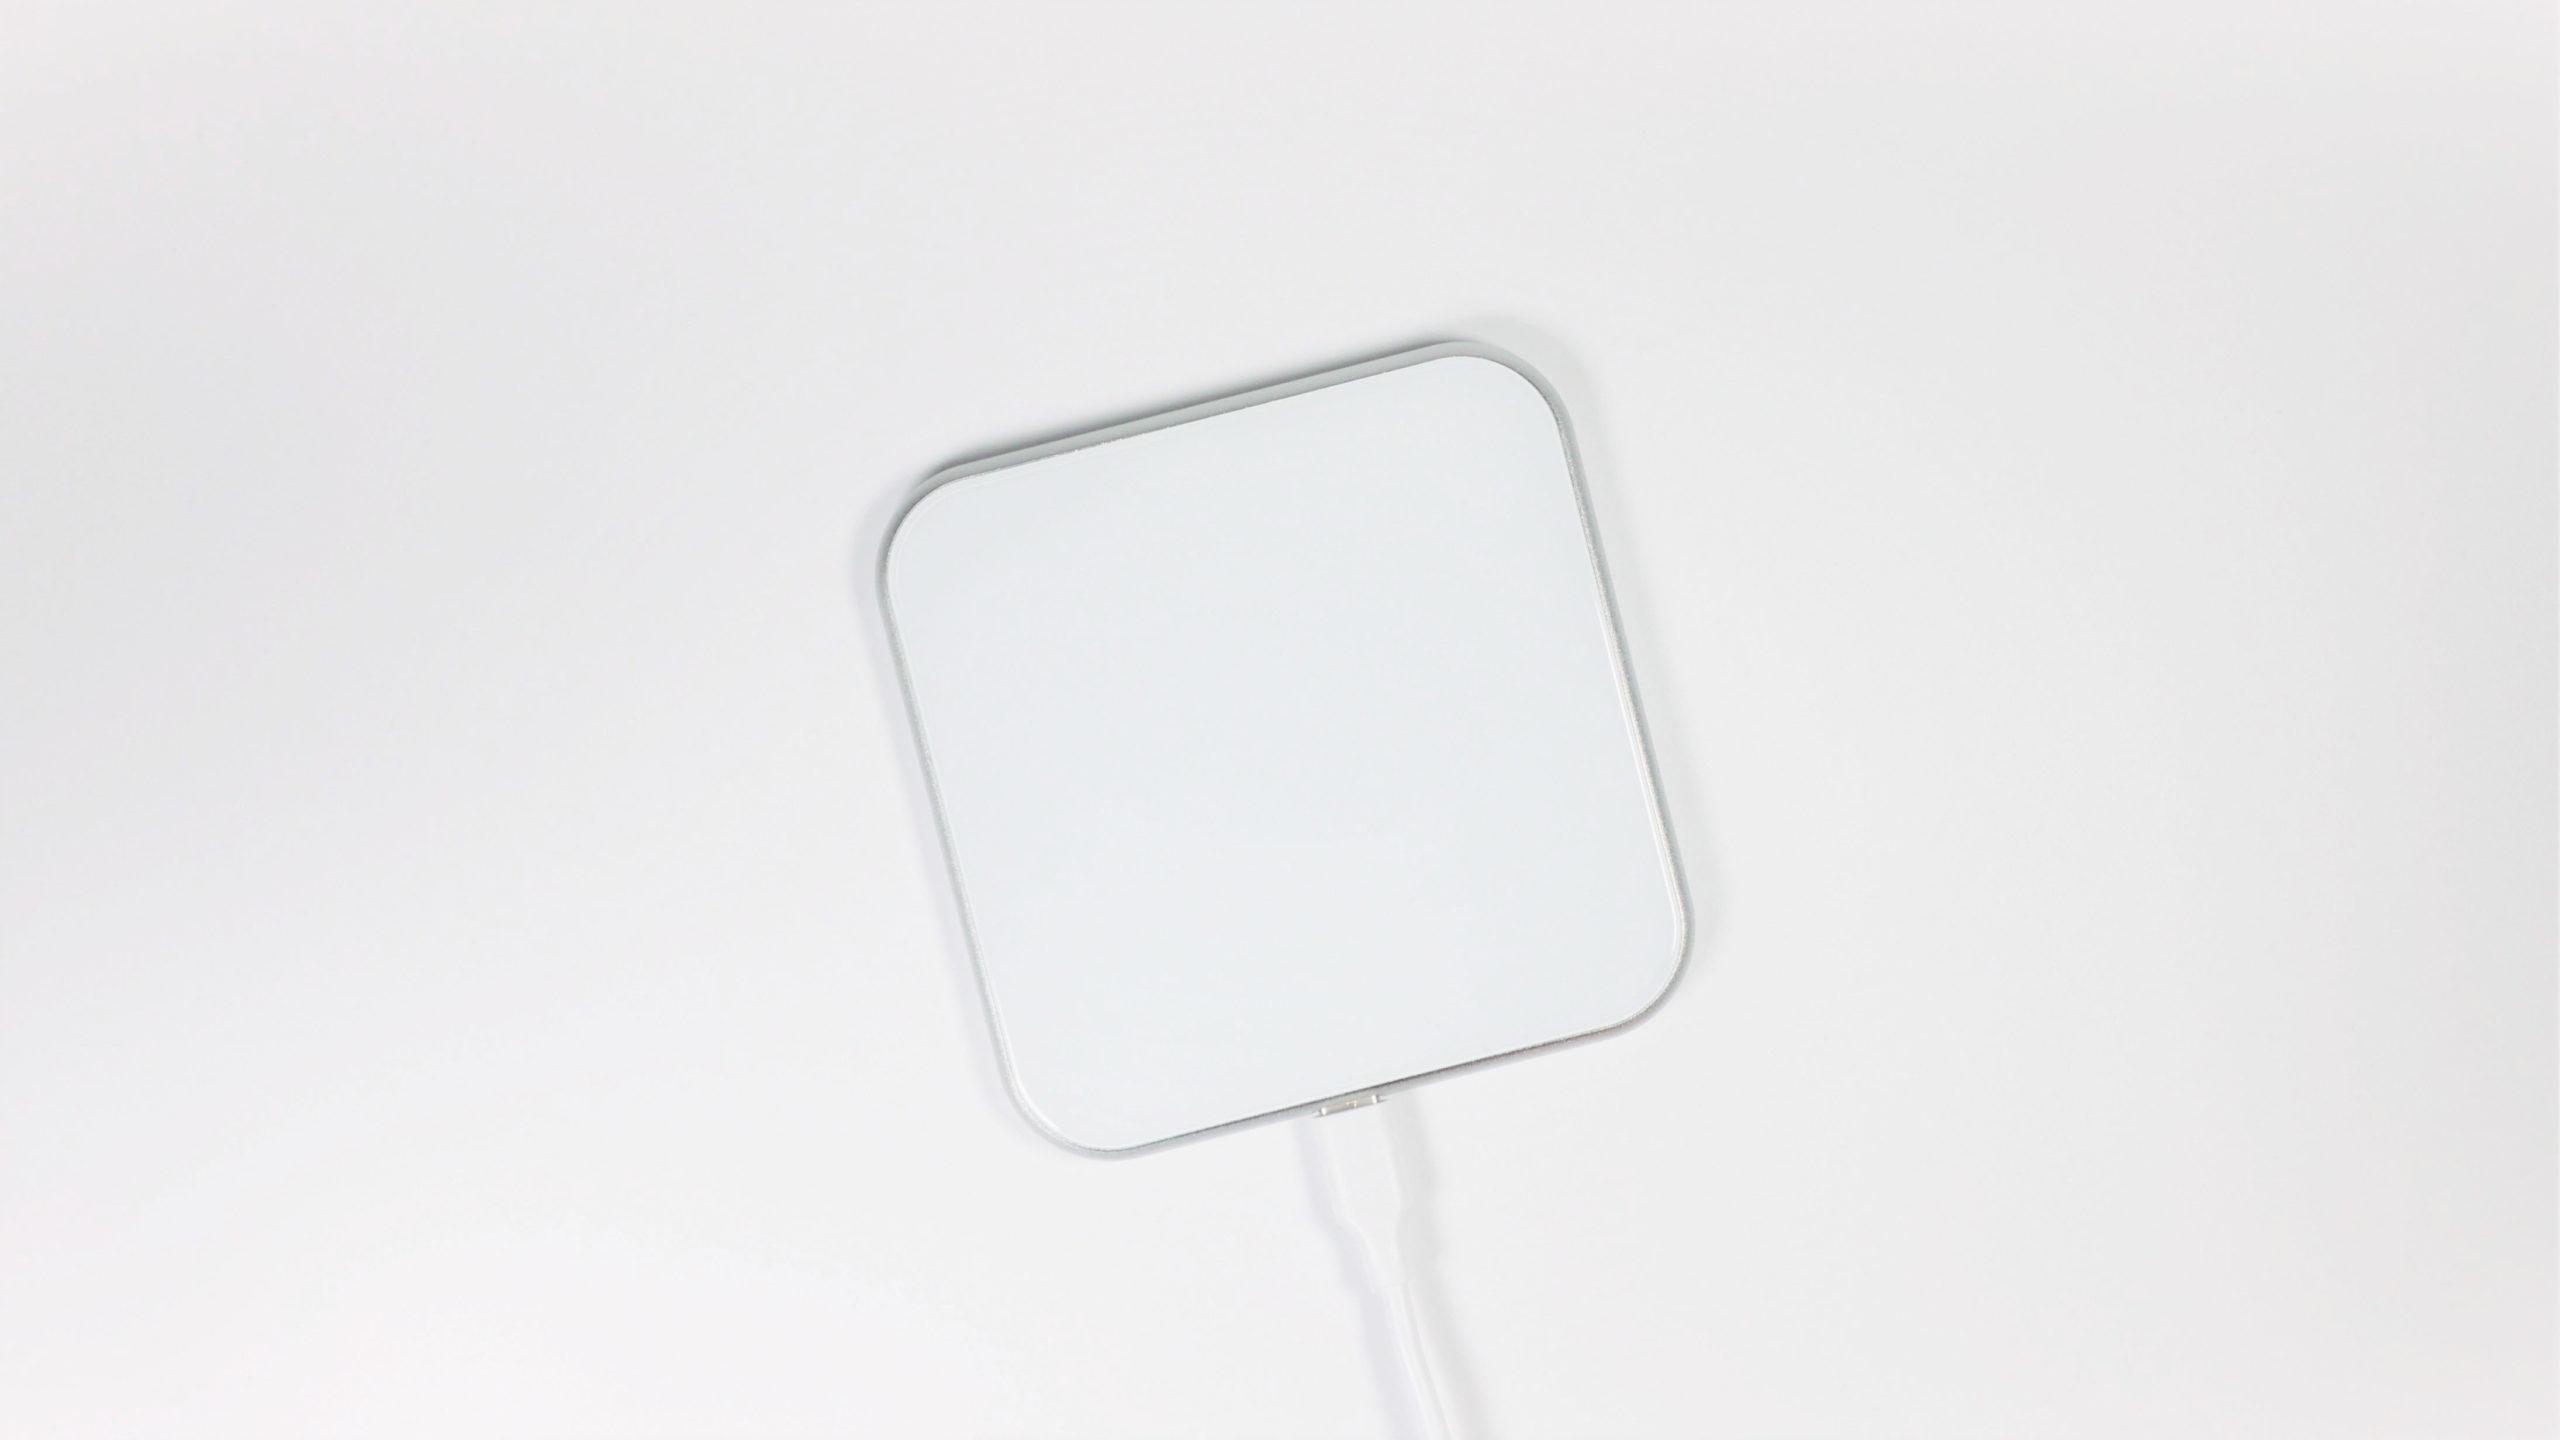 iphone デザイン ワイヤレス充電器